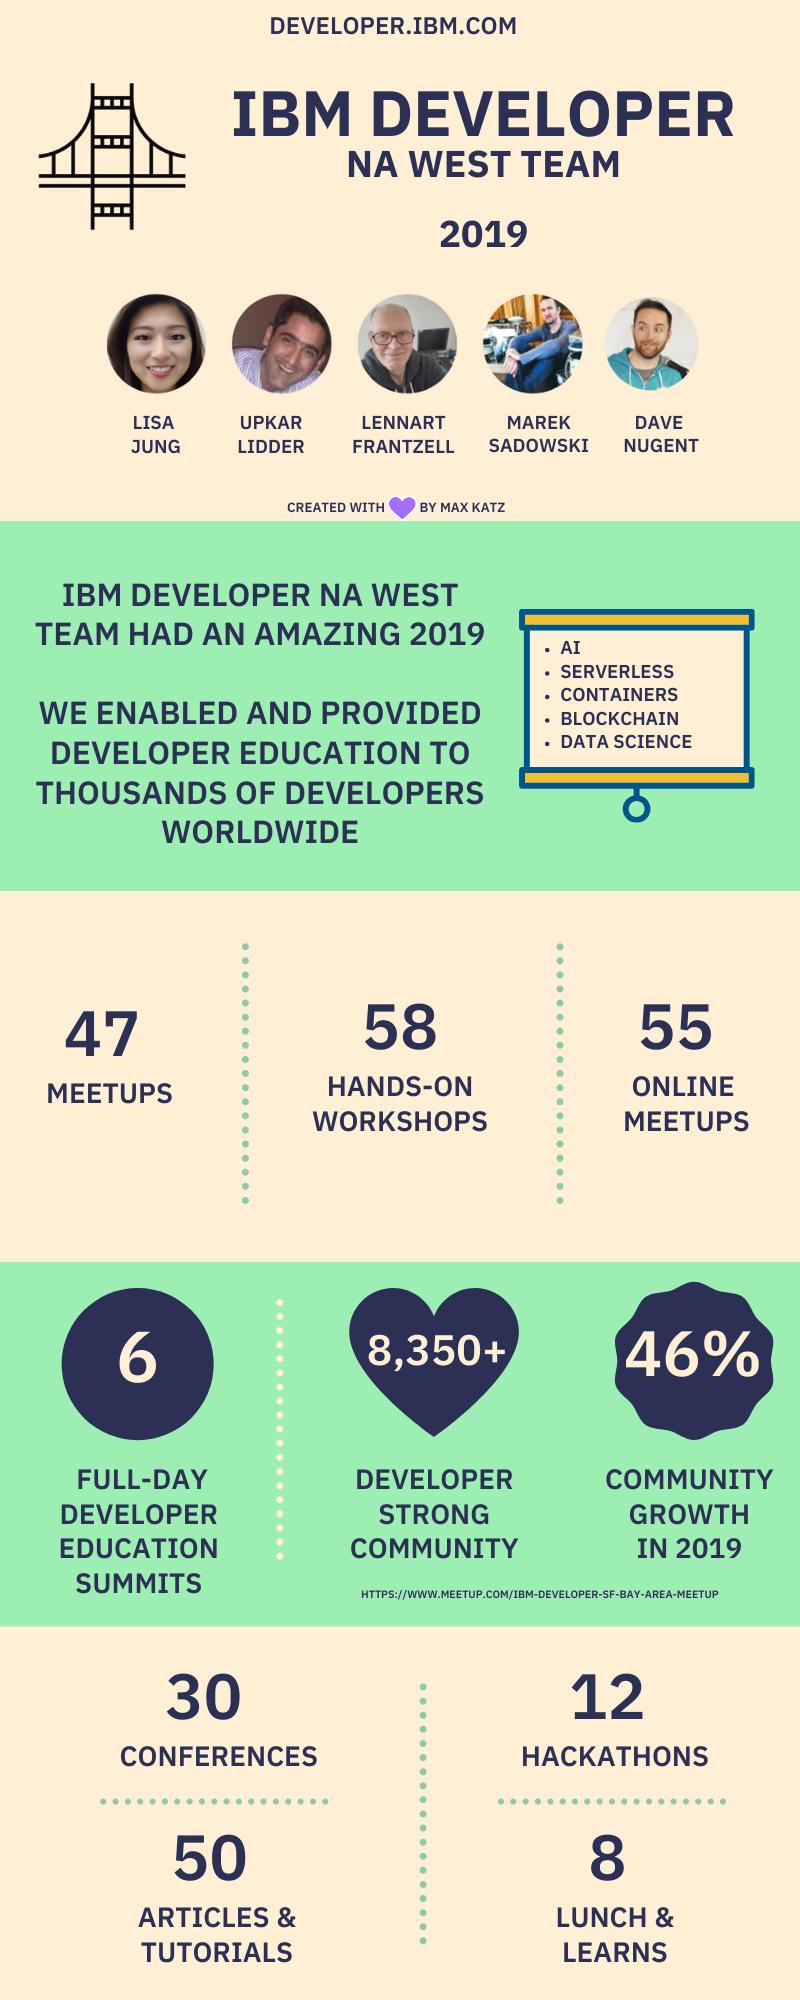 IBMDeveloperSF2019-infographic_2